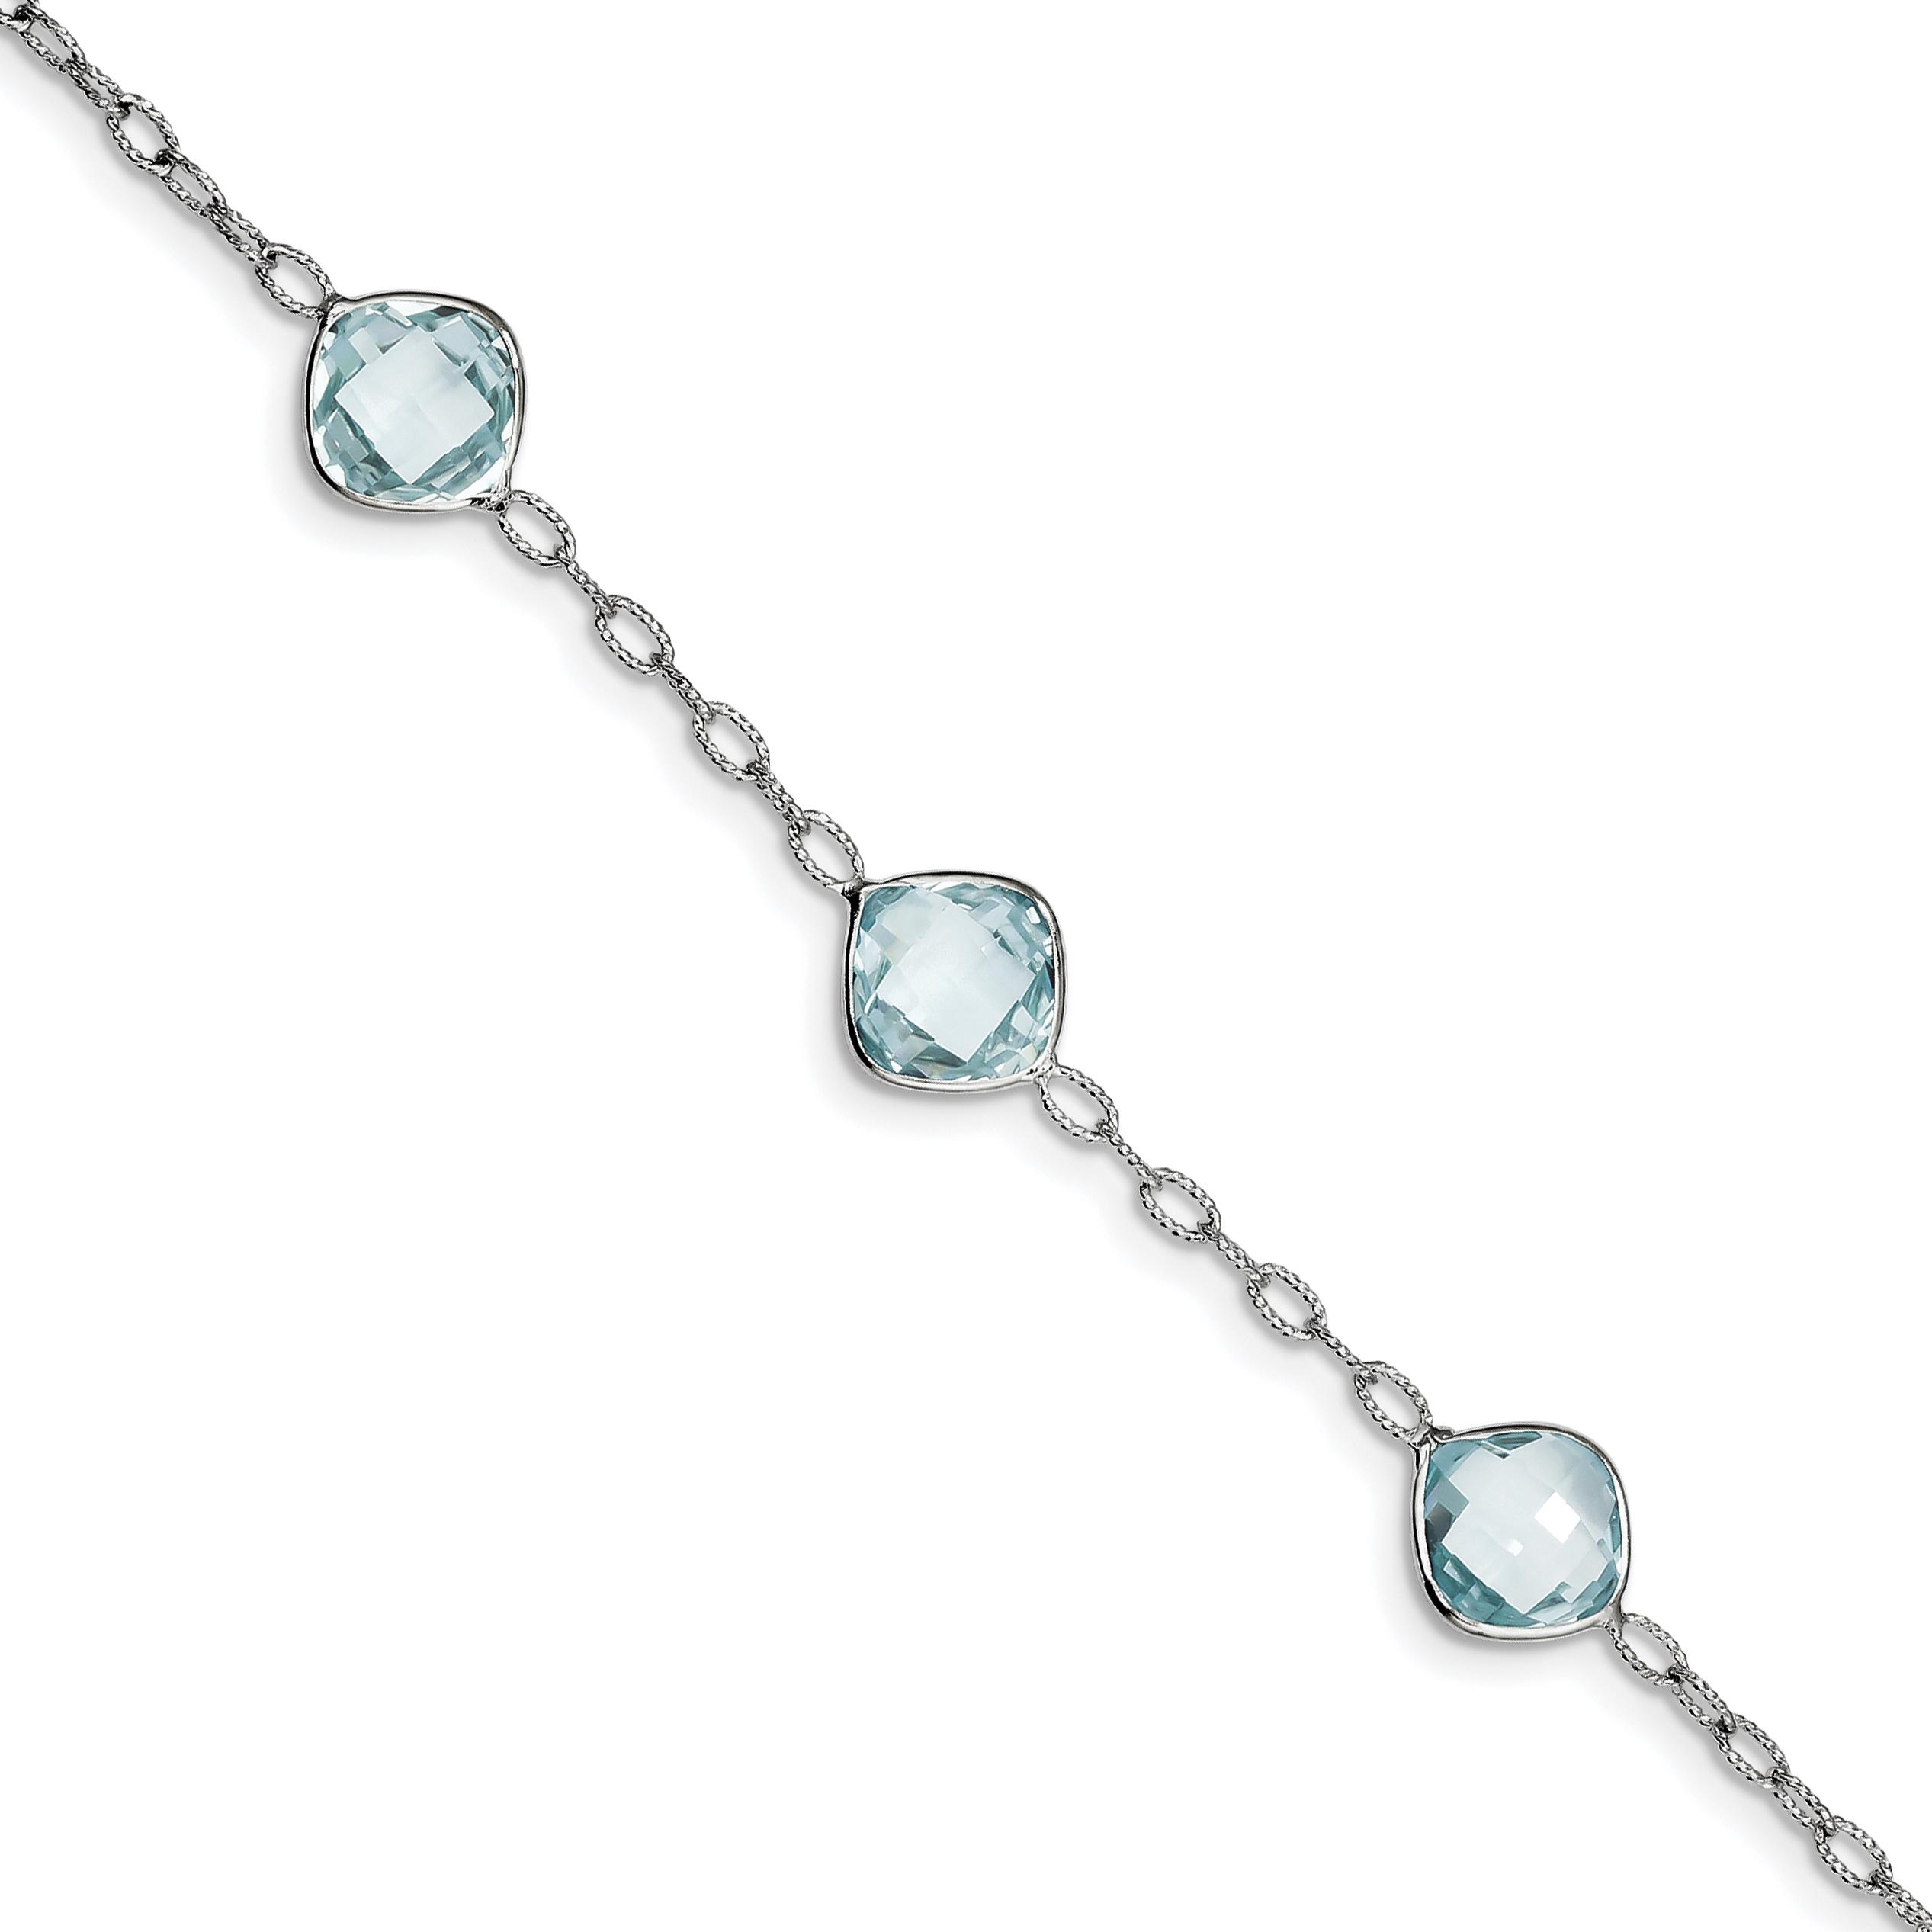 925 Sterling Silver Rhodium-plated Blue Topaz Bracelet by